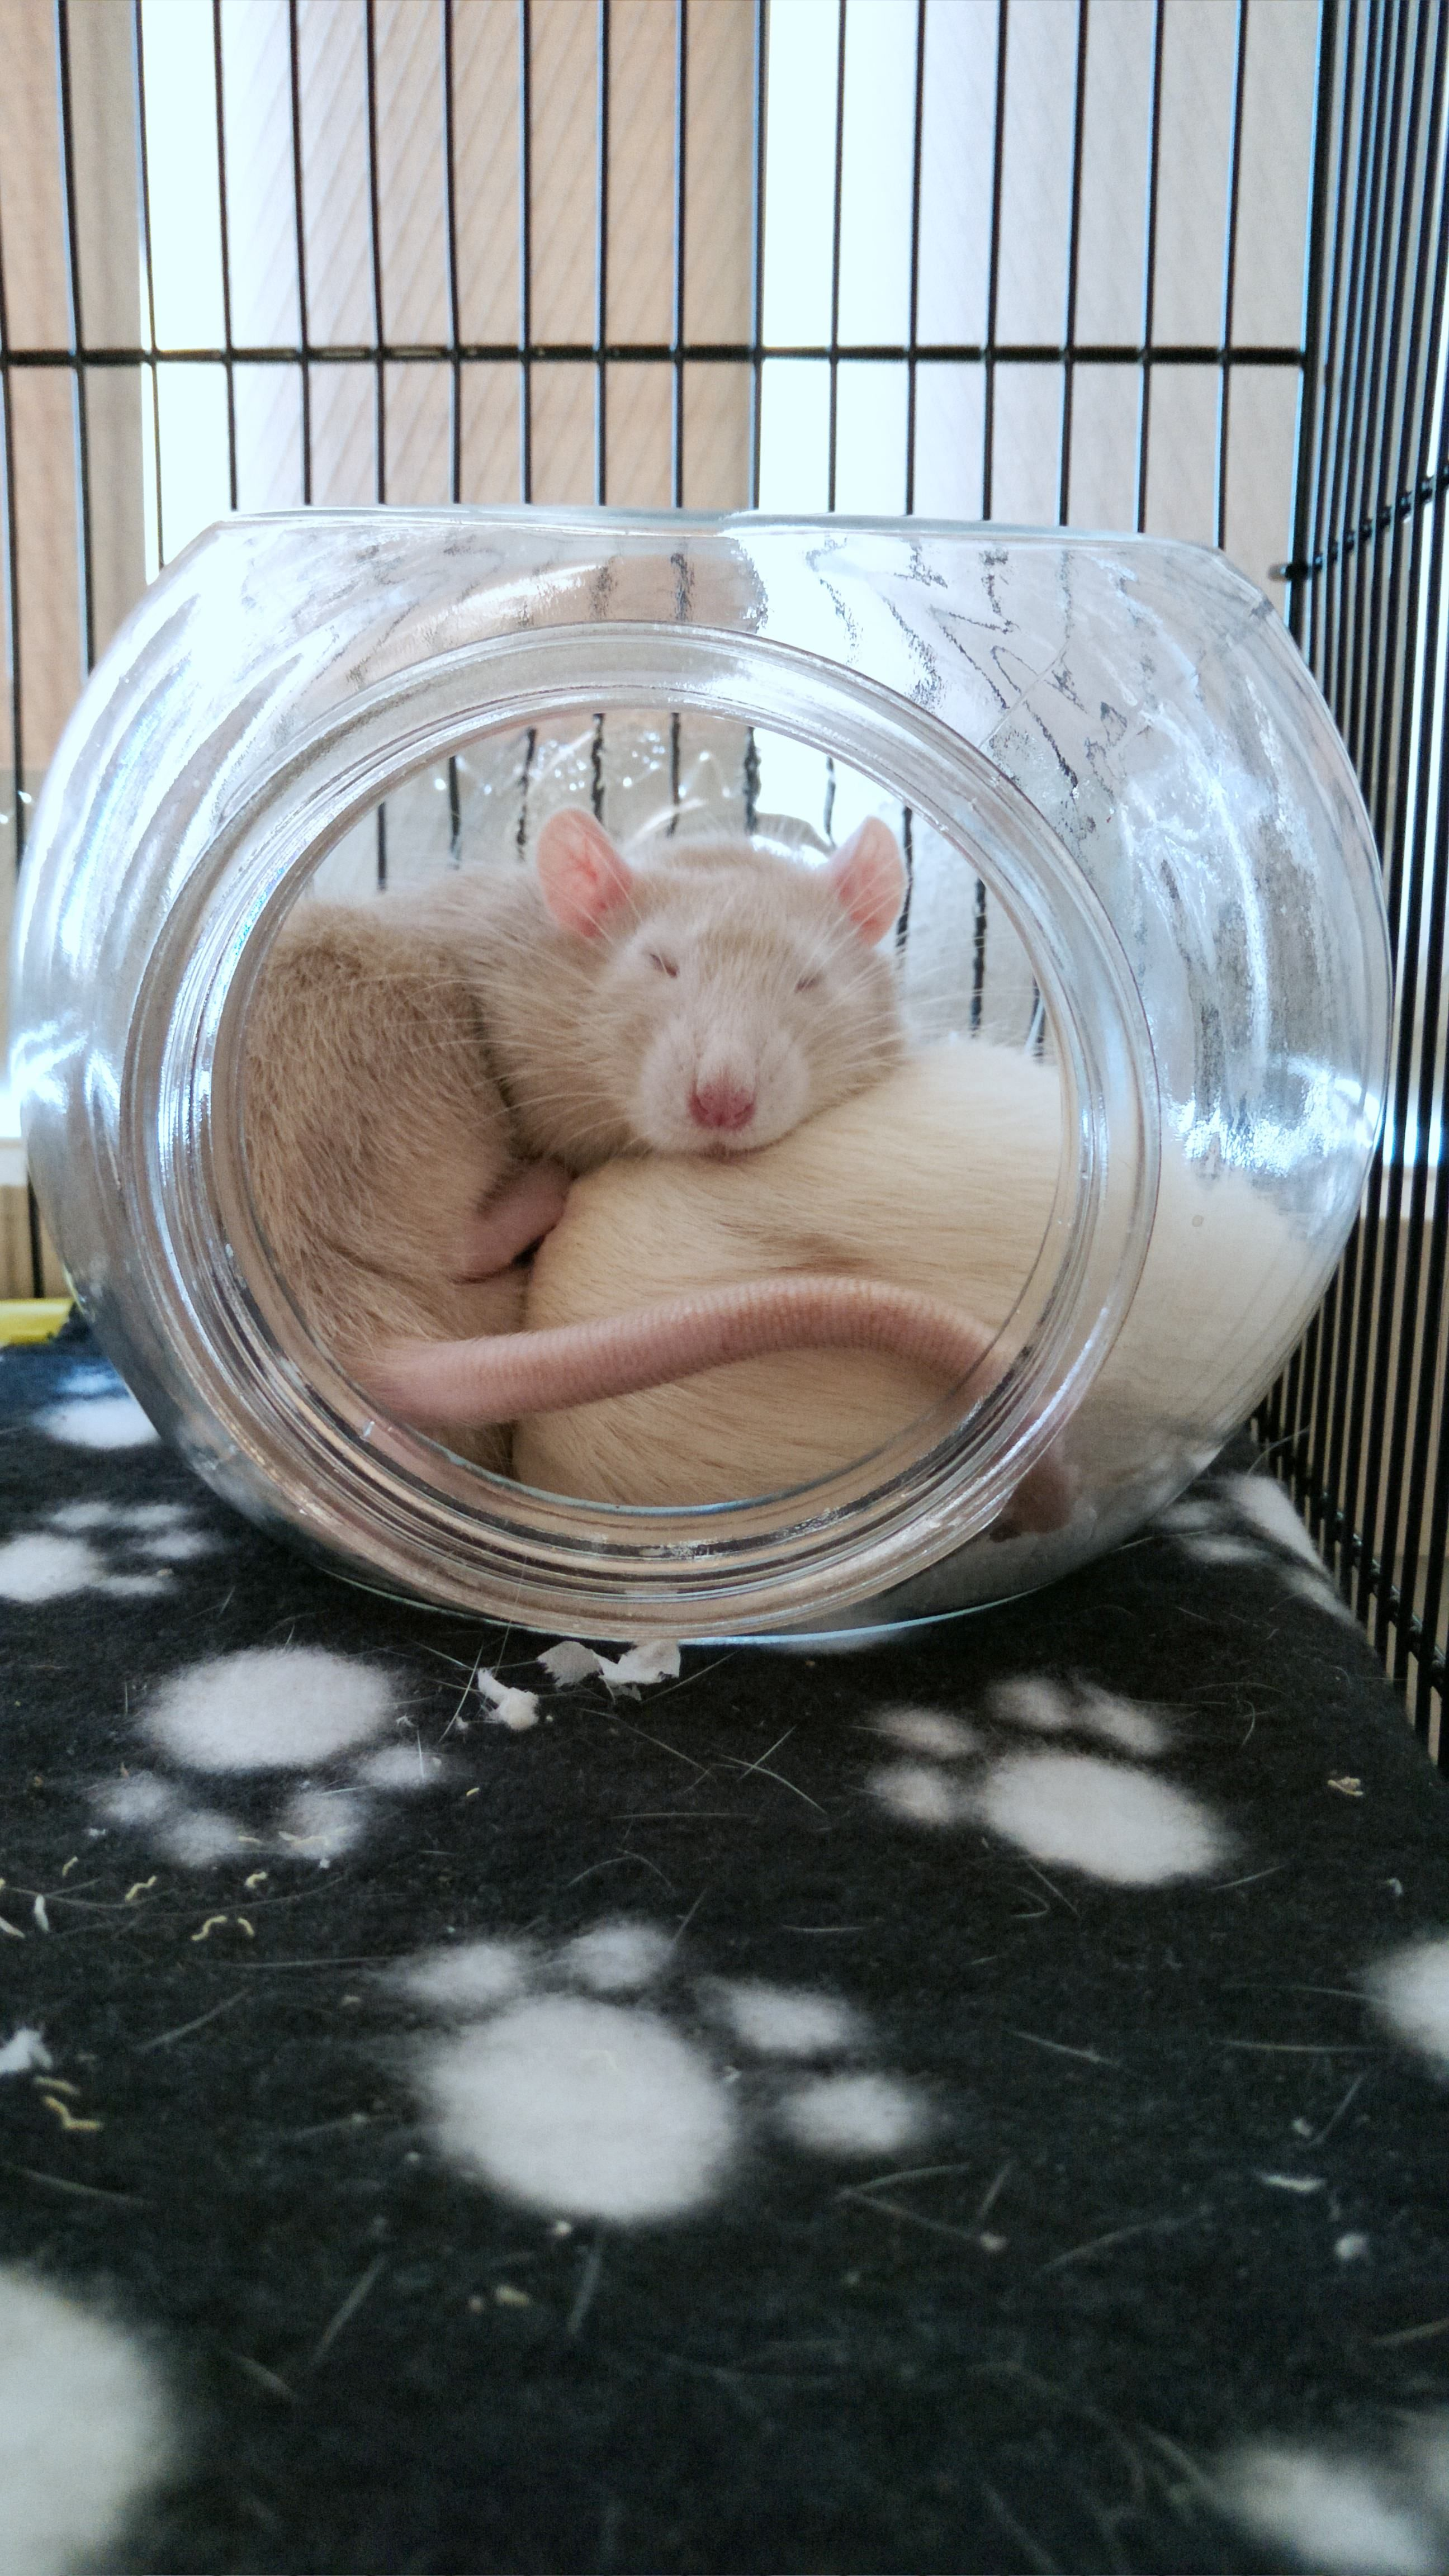 My Two Handsome Boys 3 Aww Cute Rat Cuterats Ratsofpinterest Cuddle Fluffy Animals Pets Bestfriend Ittssofluffy Pet Rat Cages Pet Rodents Pet Mice